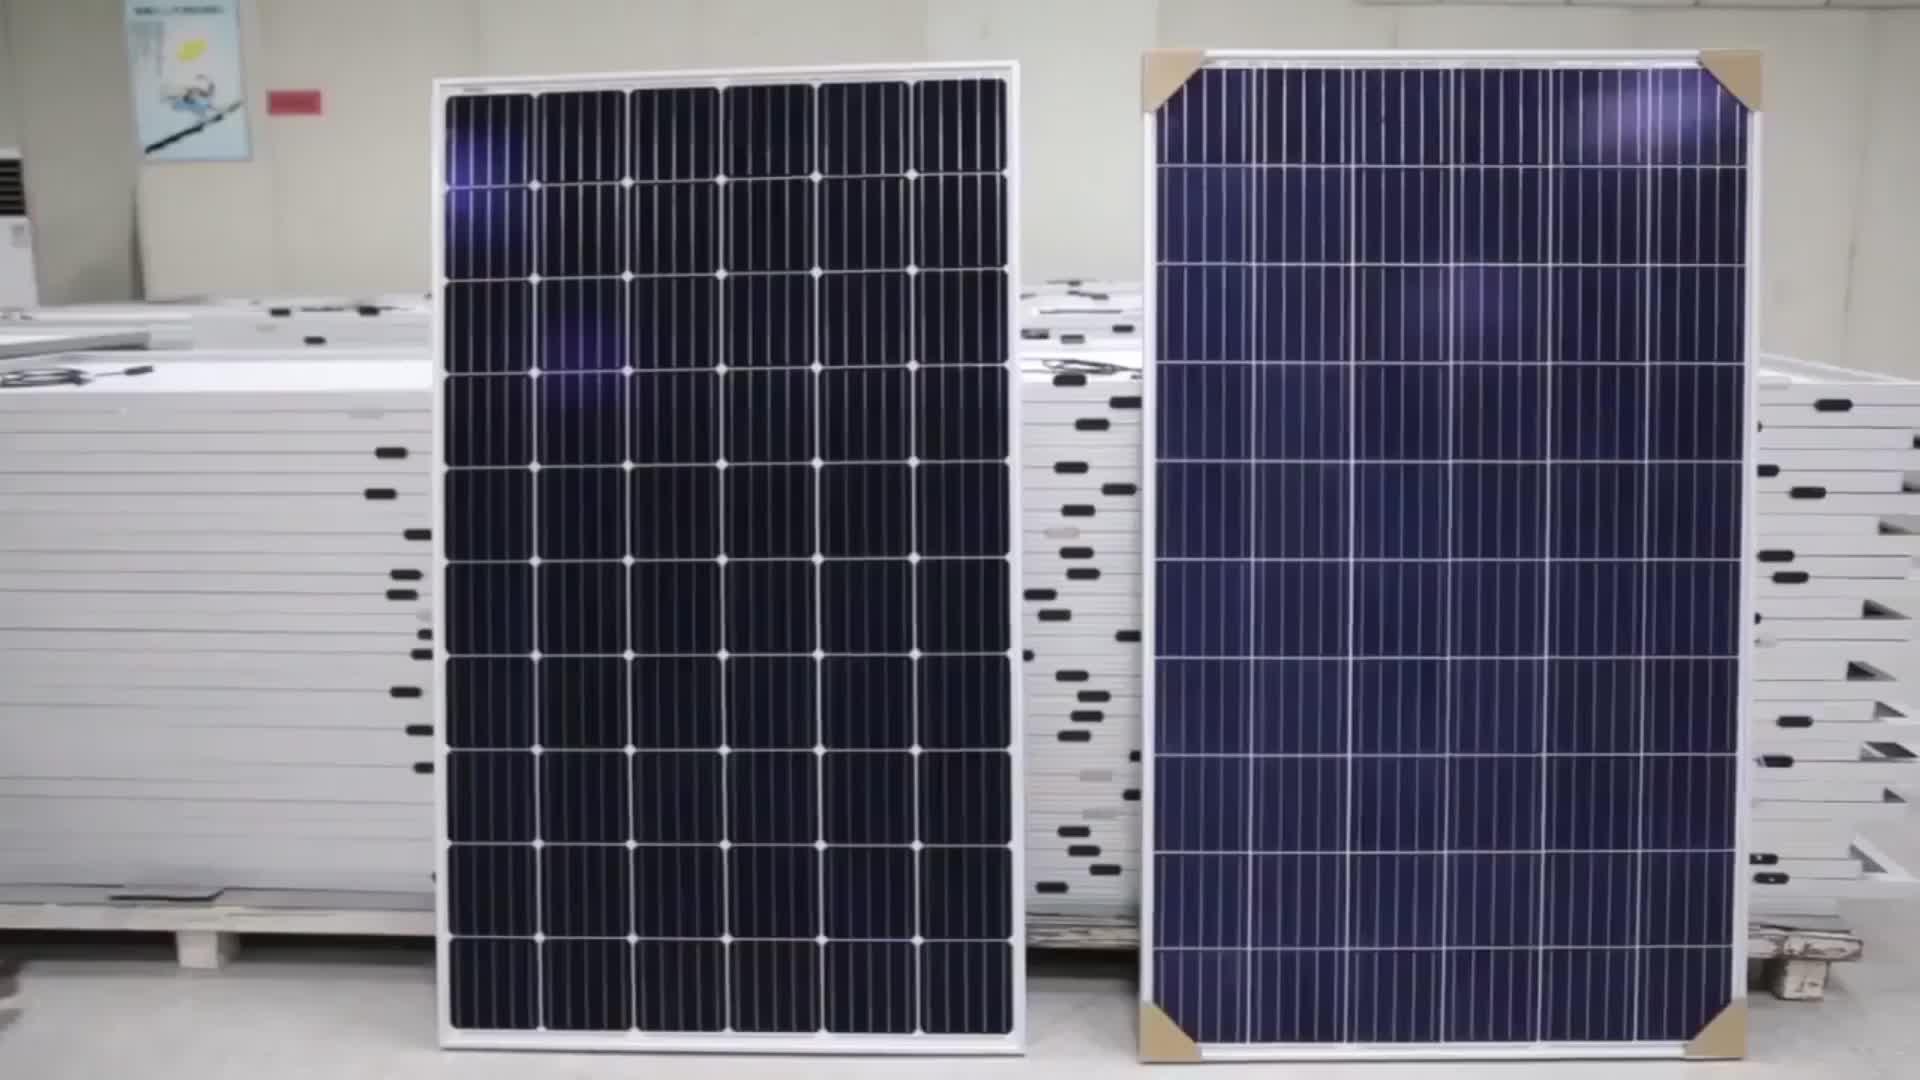 Solar panel poly 310w 320w 330w solar panels 310watt 320w 72cells polycrytalline solar panel